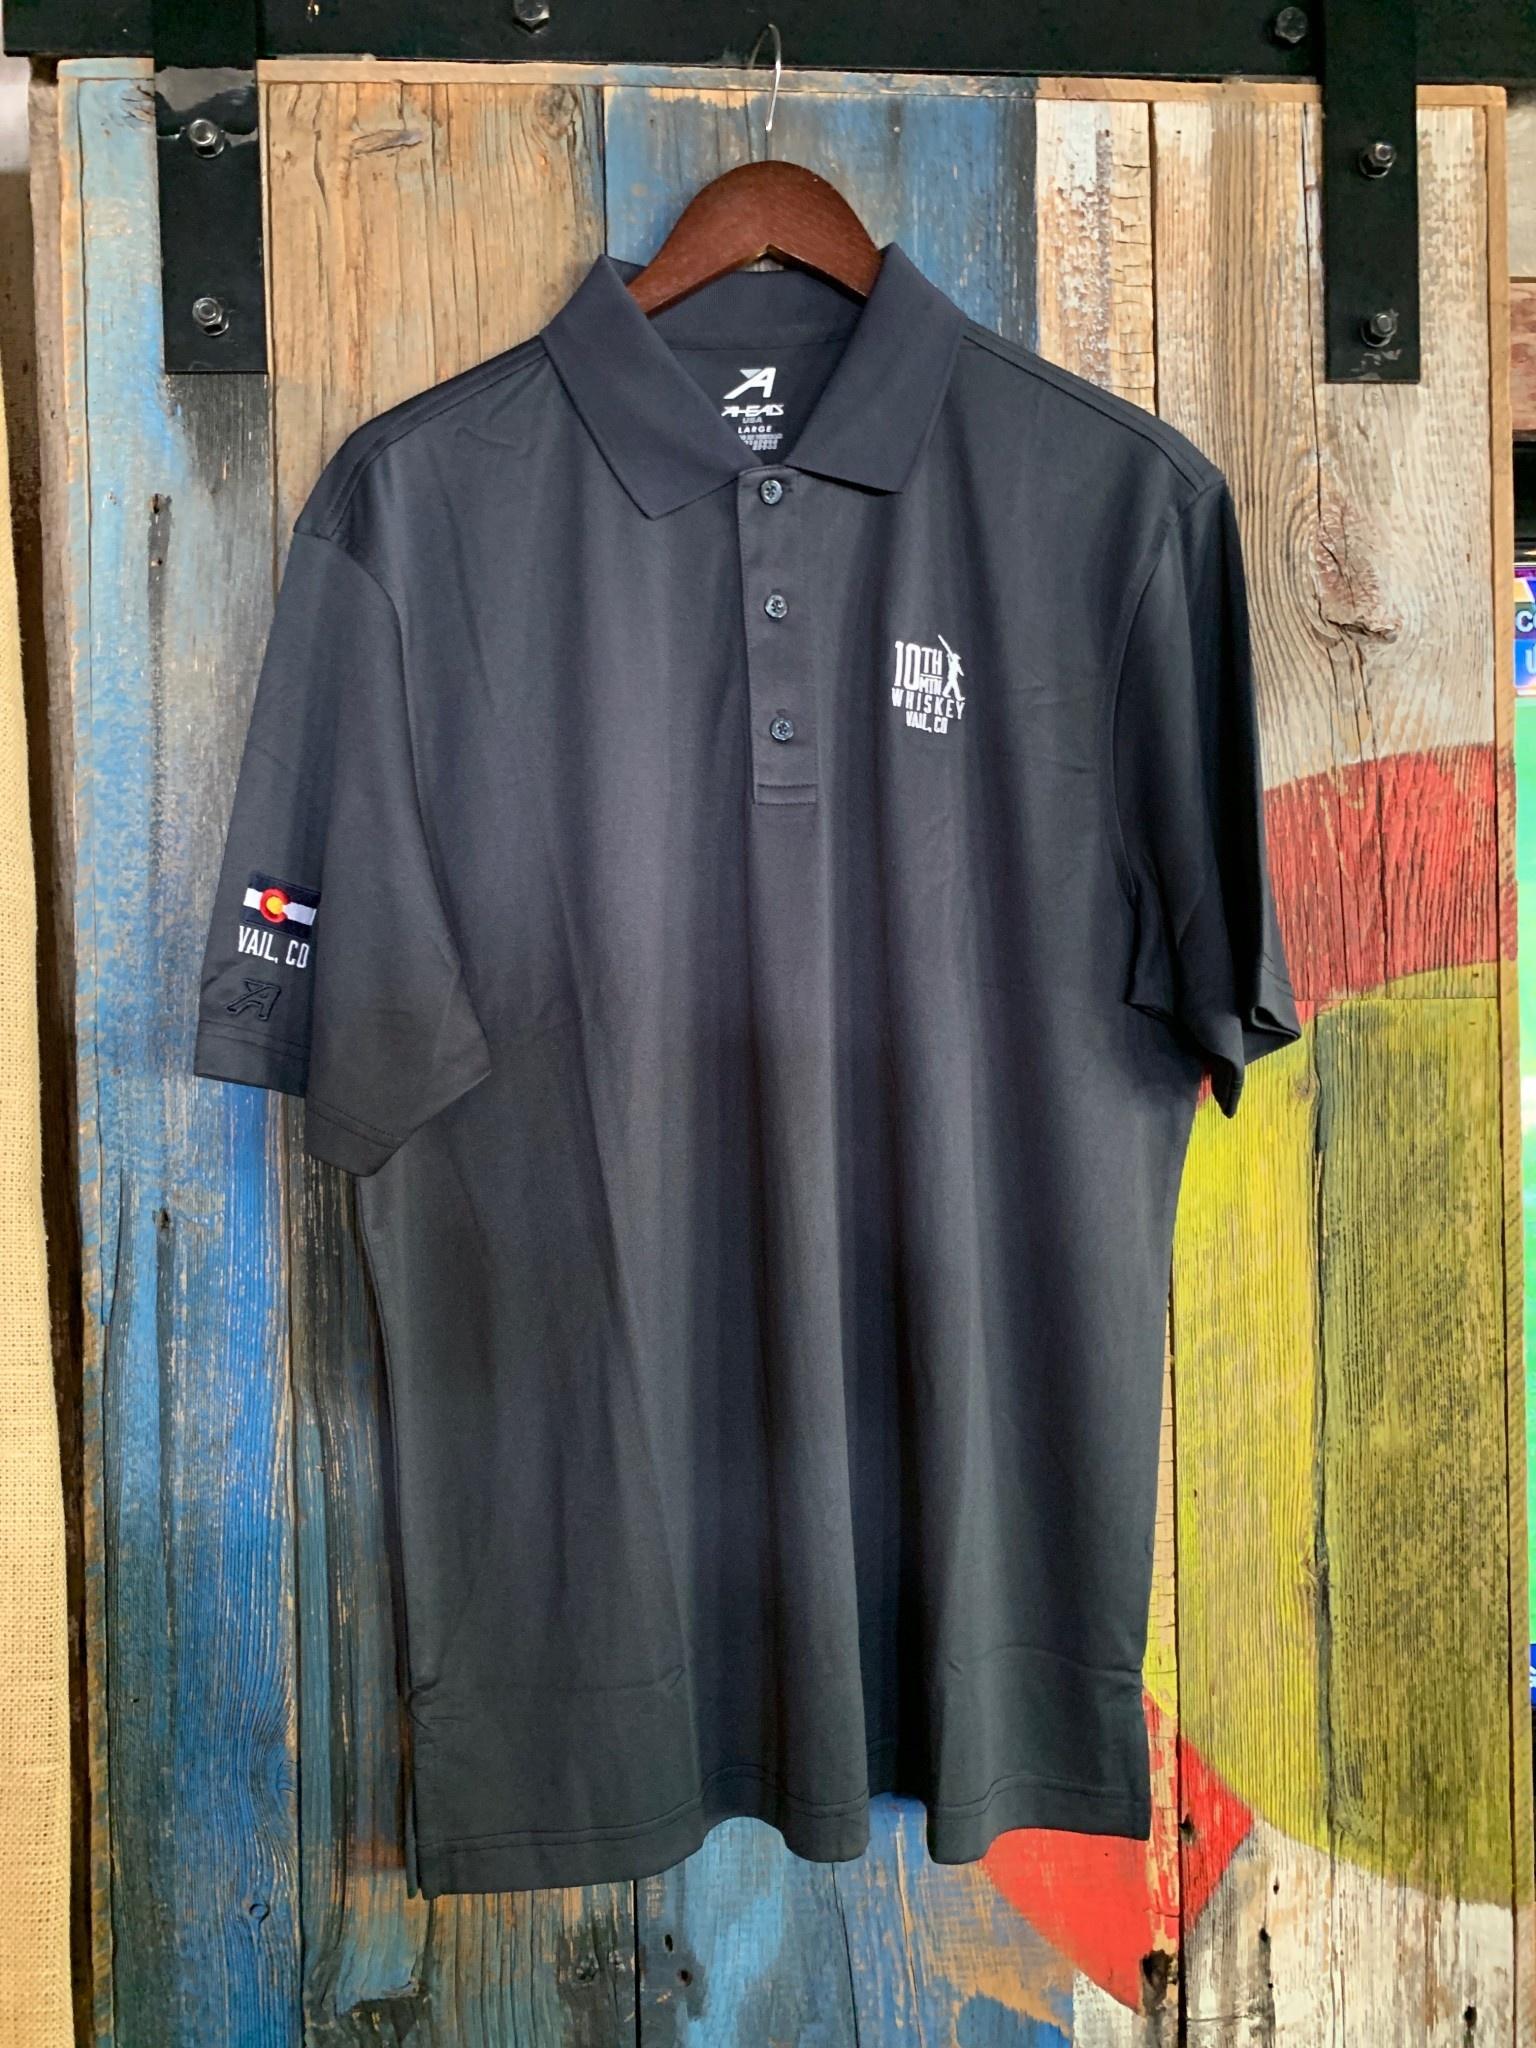 10th Mountain Whiskey & Spirit Co. Men's Golf Shirt - Navy XL